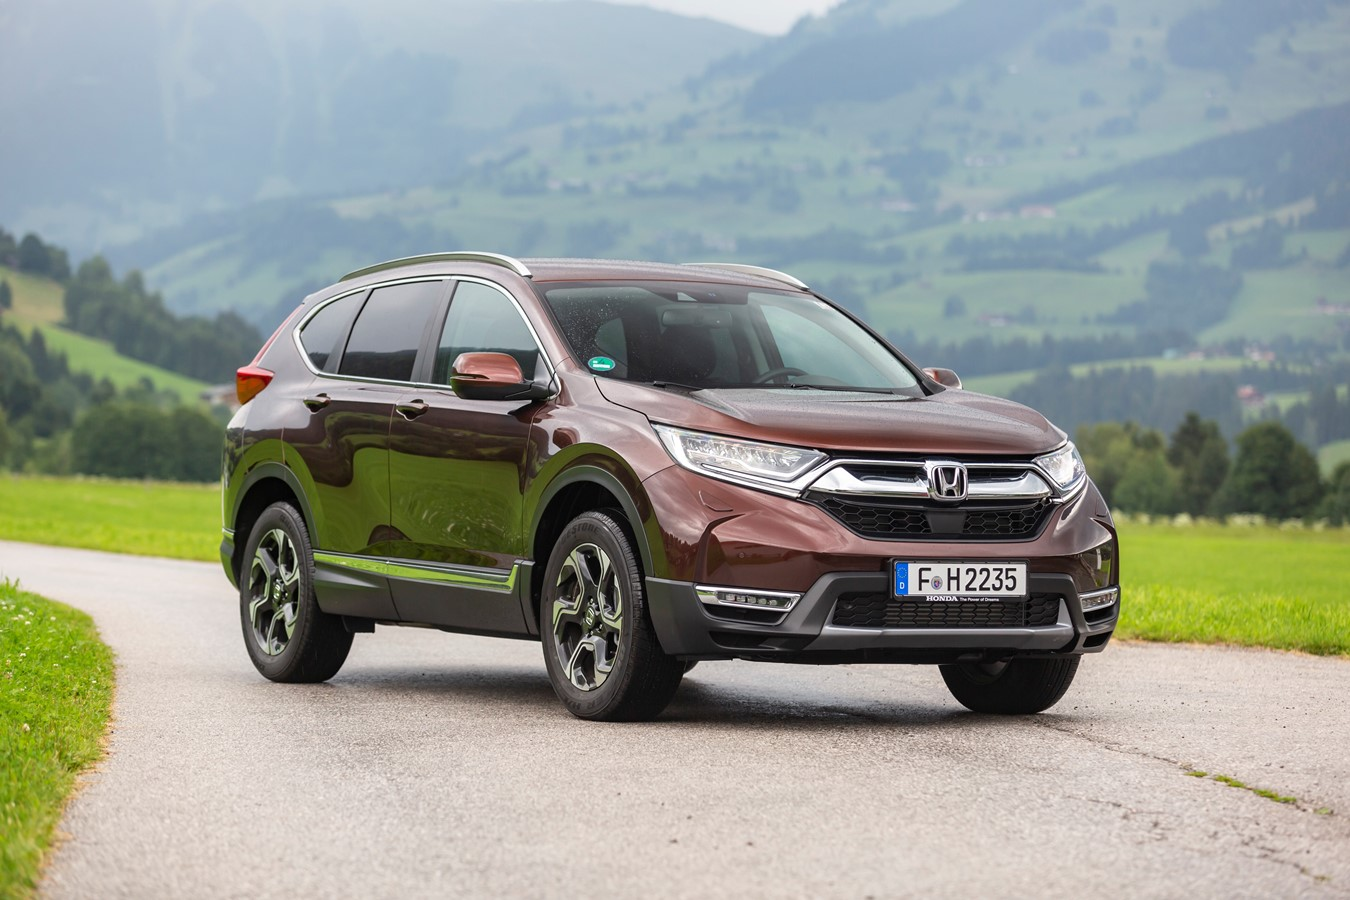 2018 Honda Cr V Vtec Turbo Petrol 2003 Engine Wiring Diagram